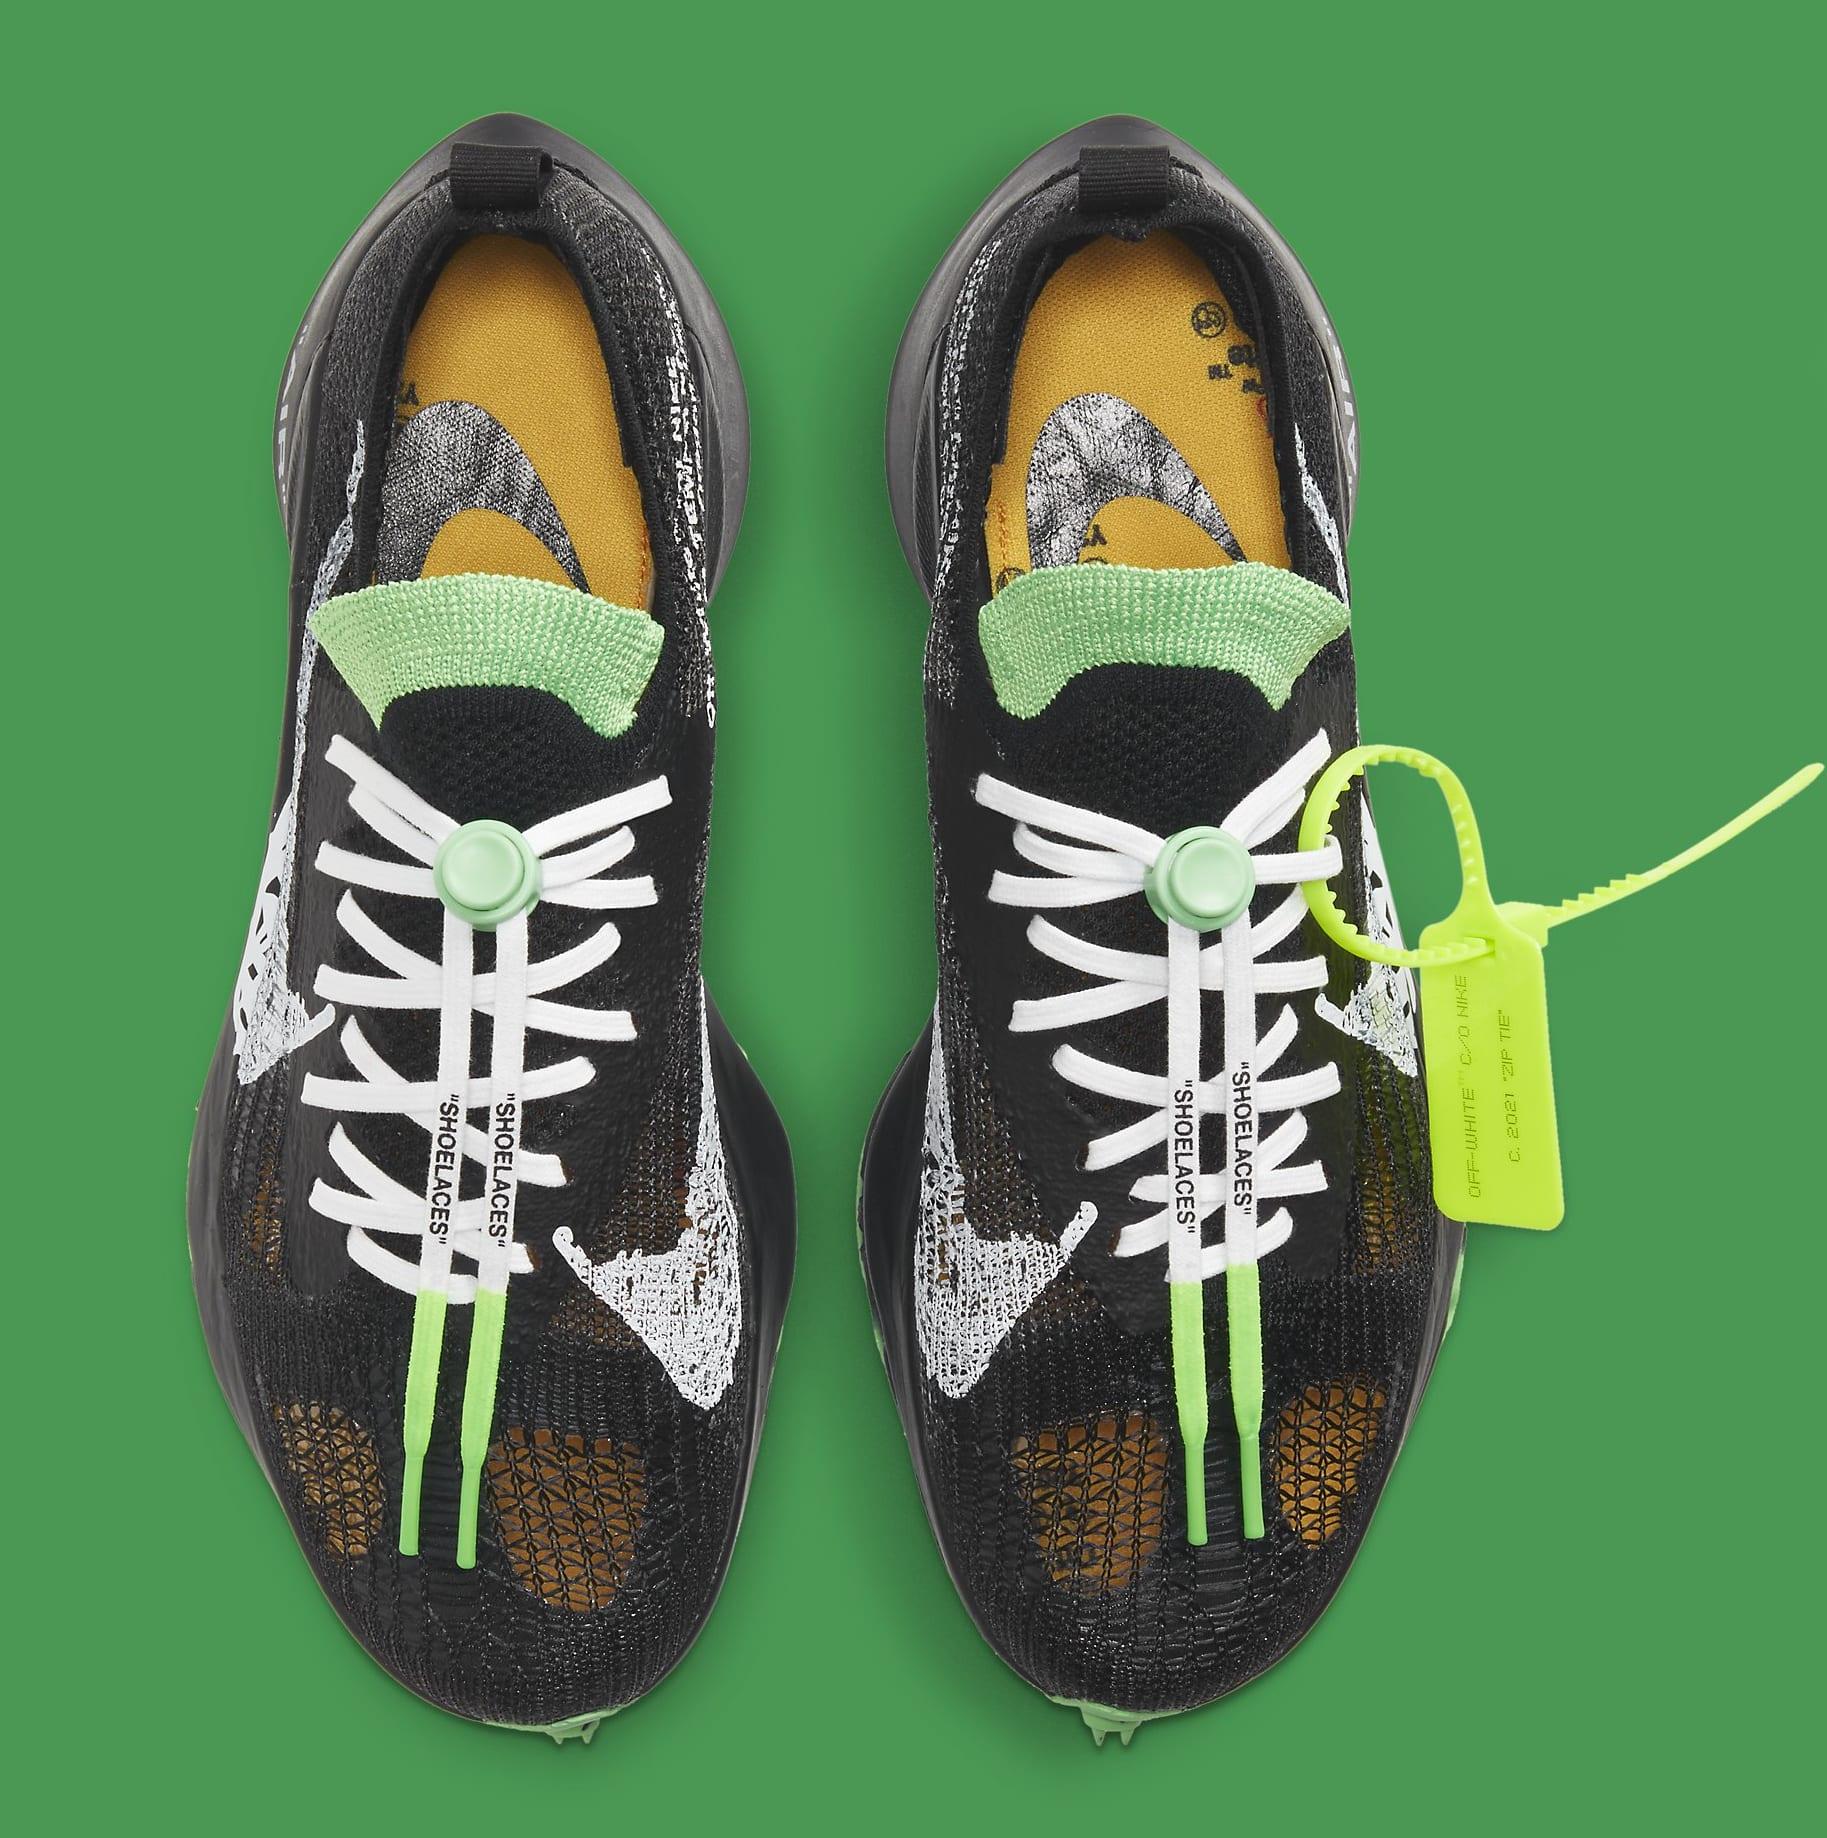 Off-White x Nike Air Zoom Tempo Next% CV0697-001 Top